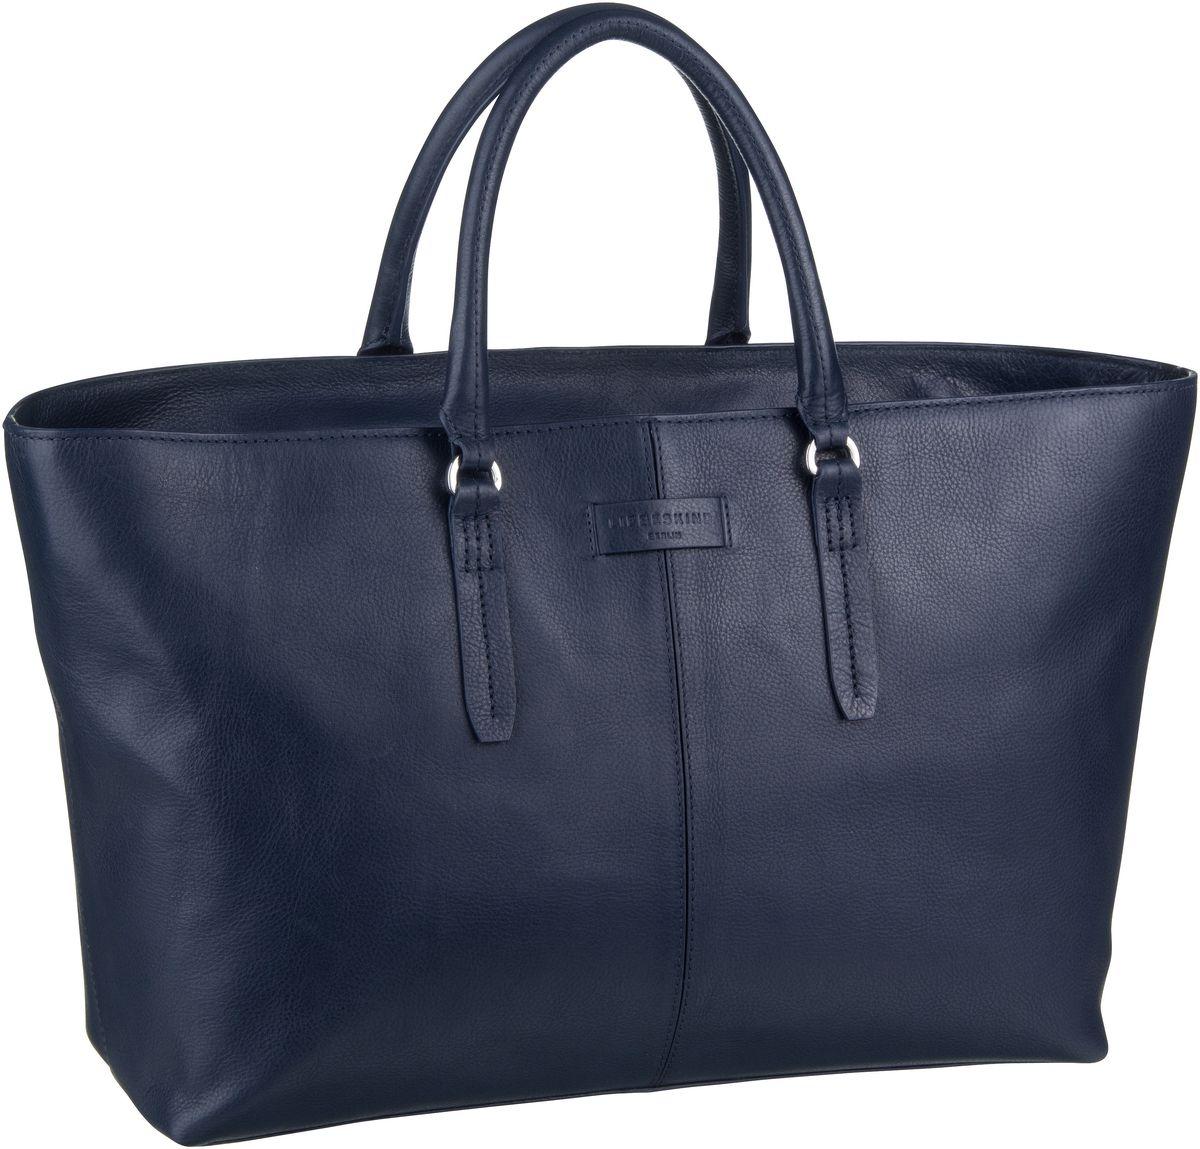 Berlin Shopper Essential Satchel L Navy Blue